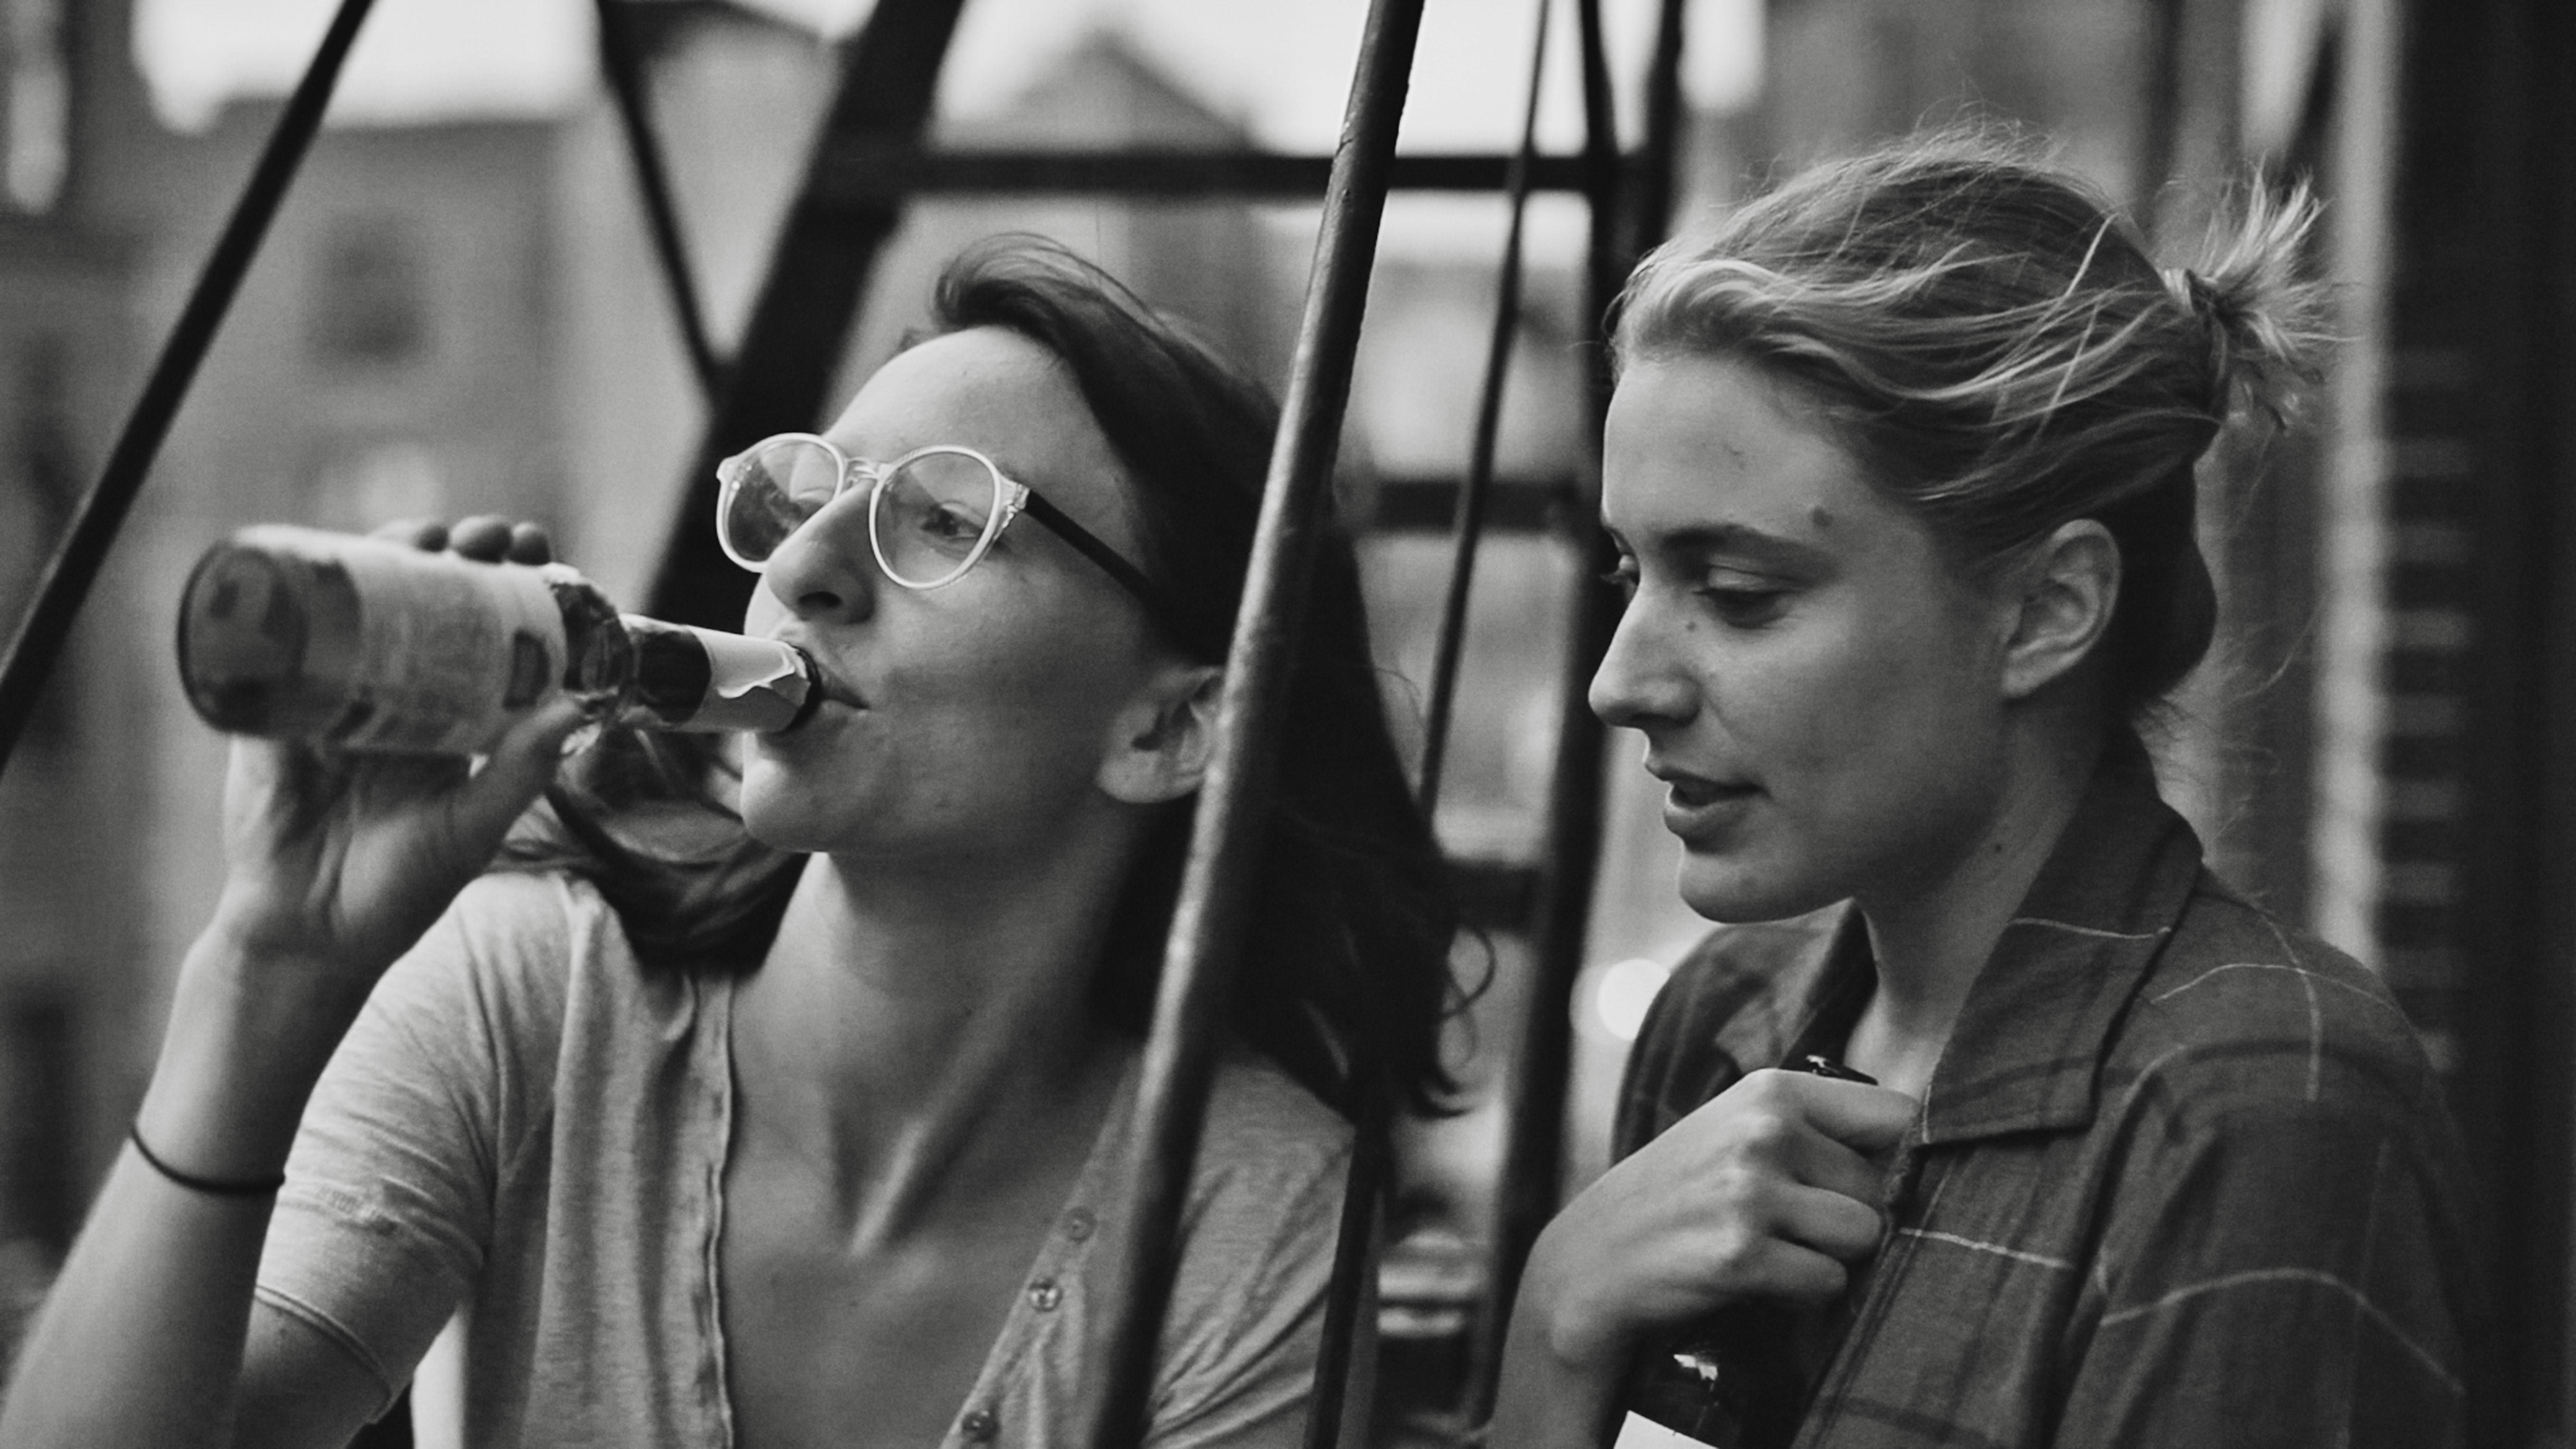 Frances Ha: Sophie (Mickey Sumner) and Frances (Greta Gerwig)